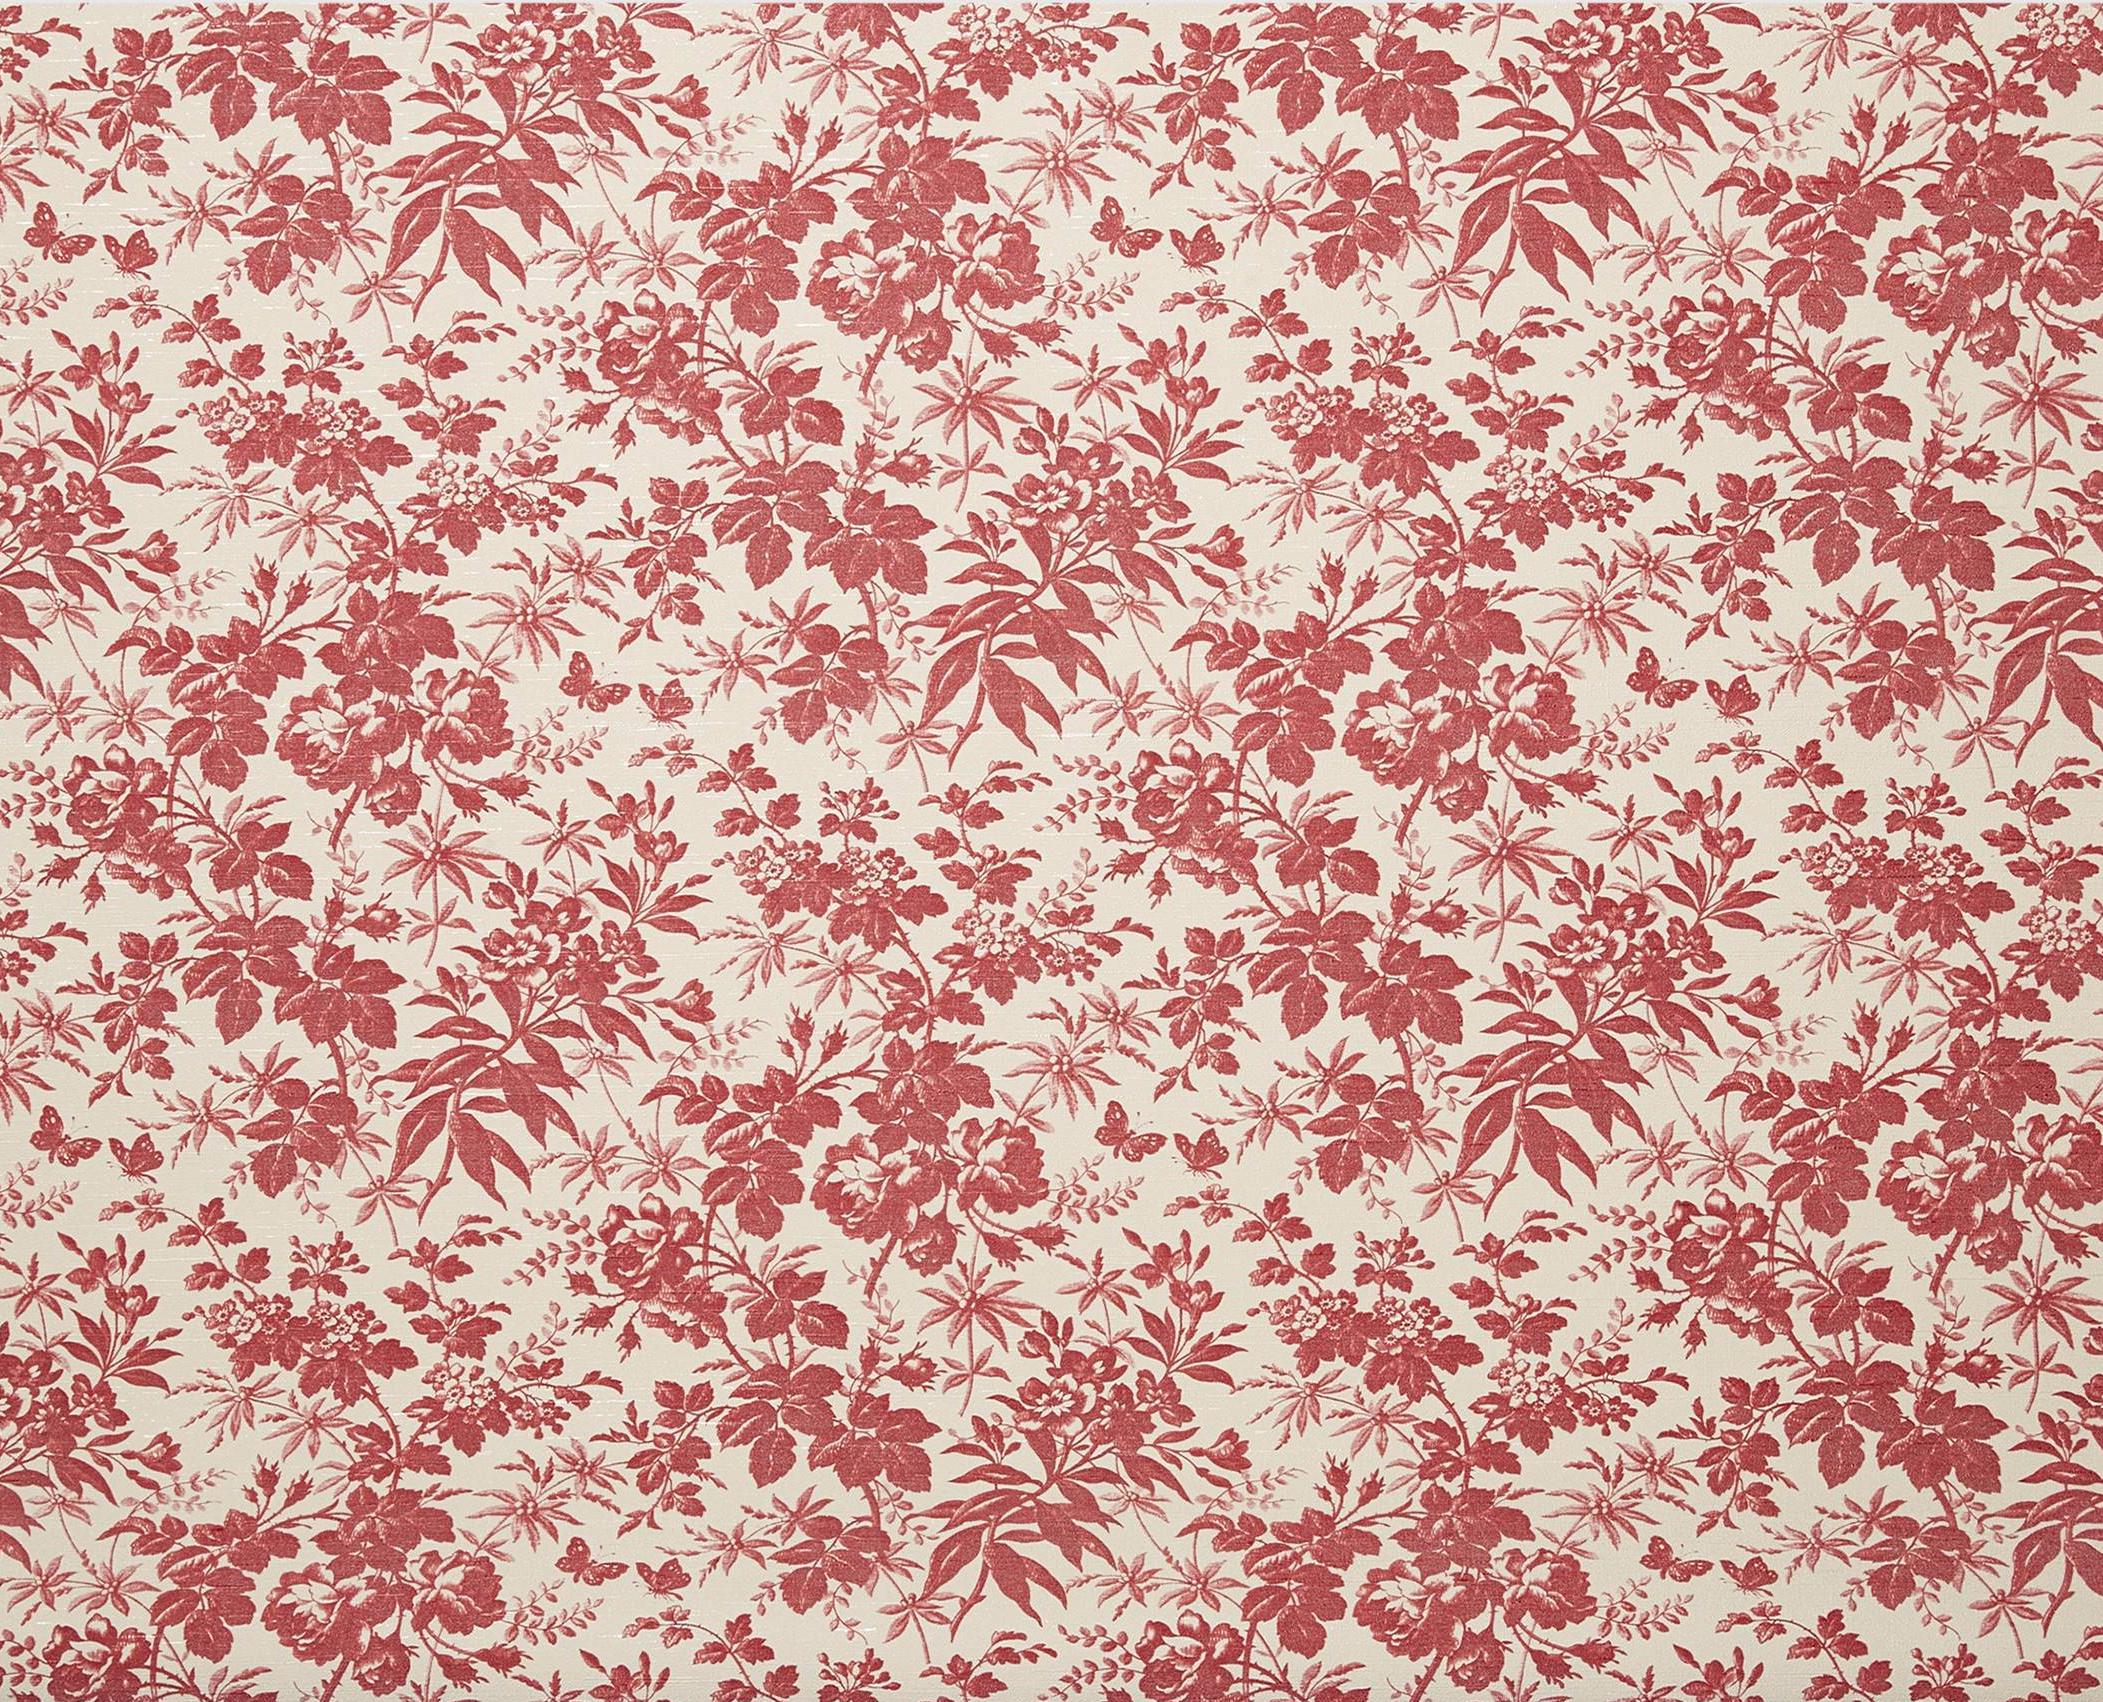 Gucci Light-Herbarium-print-wallpaper